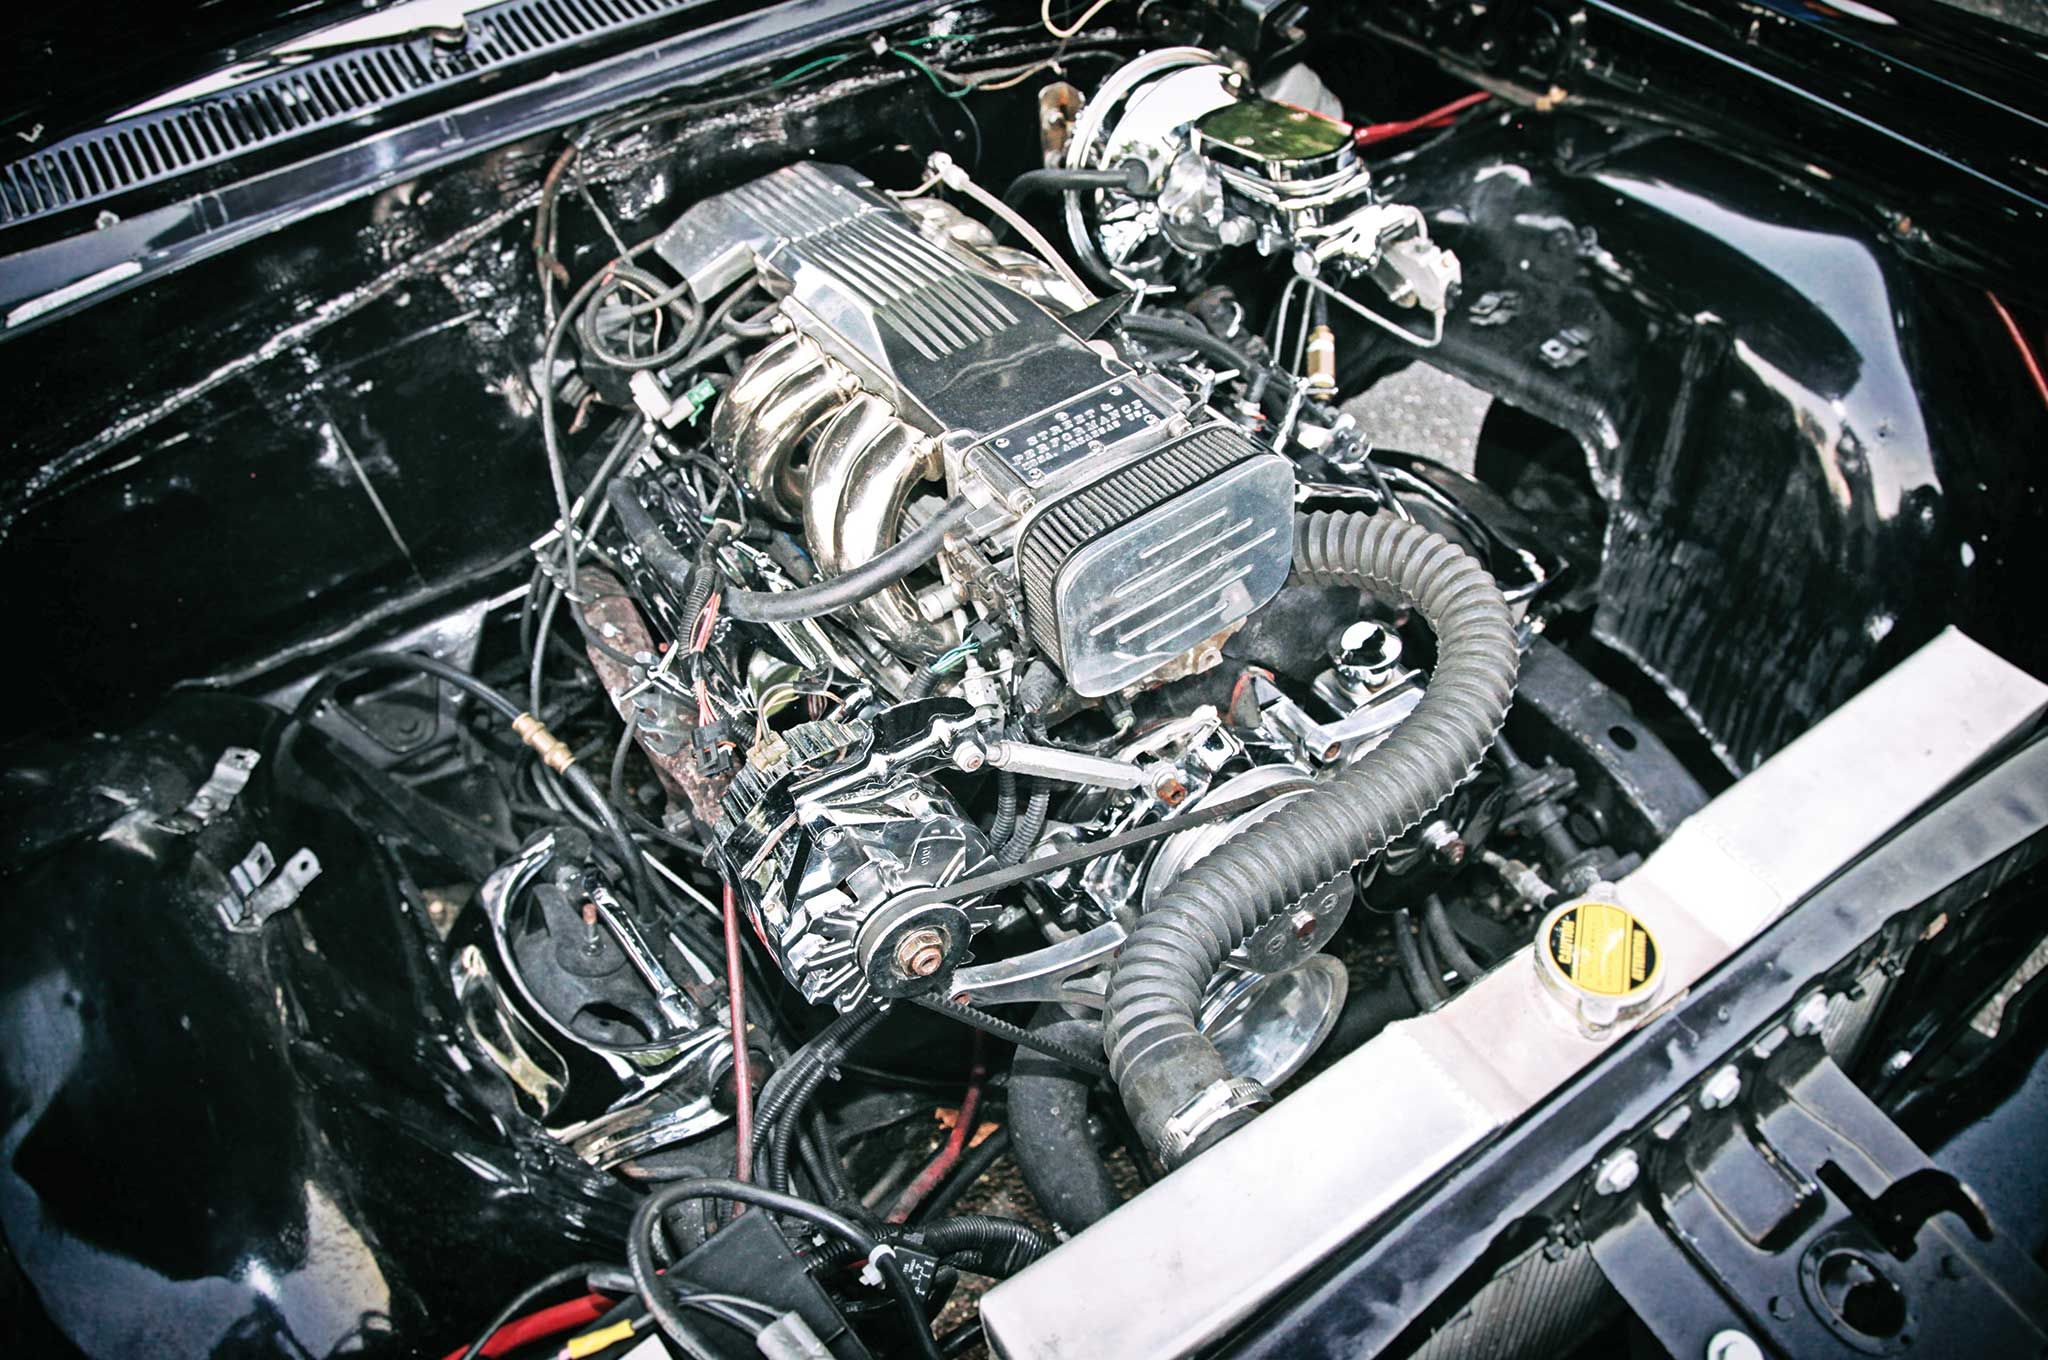 350 engine 0041964 chevrolet impala 350 engine 0041964 chevrolet impala purple leather interior 0111964 chevrolet impala purple leather interior 0111964